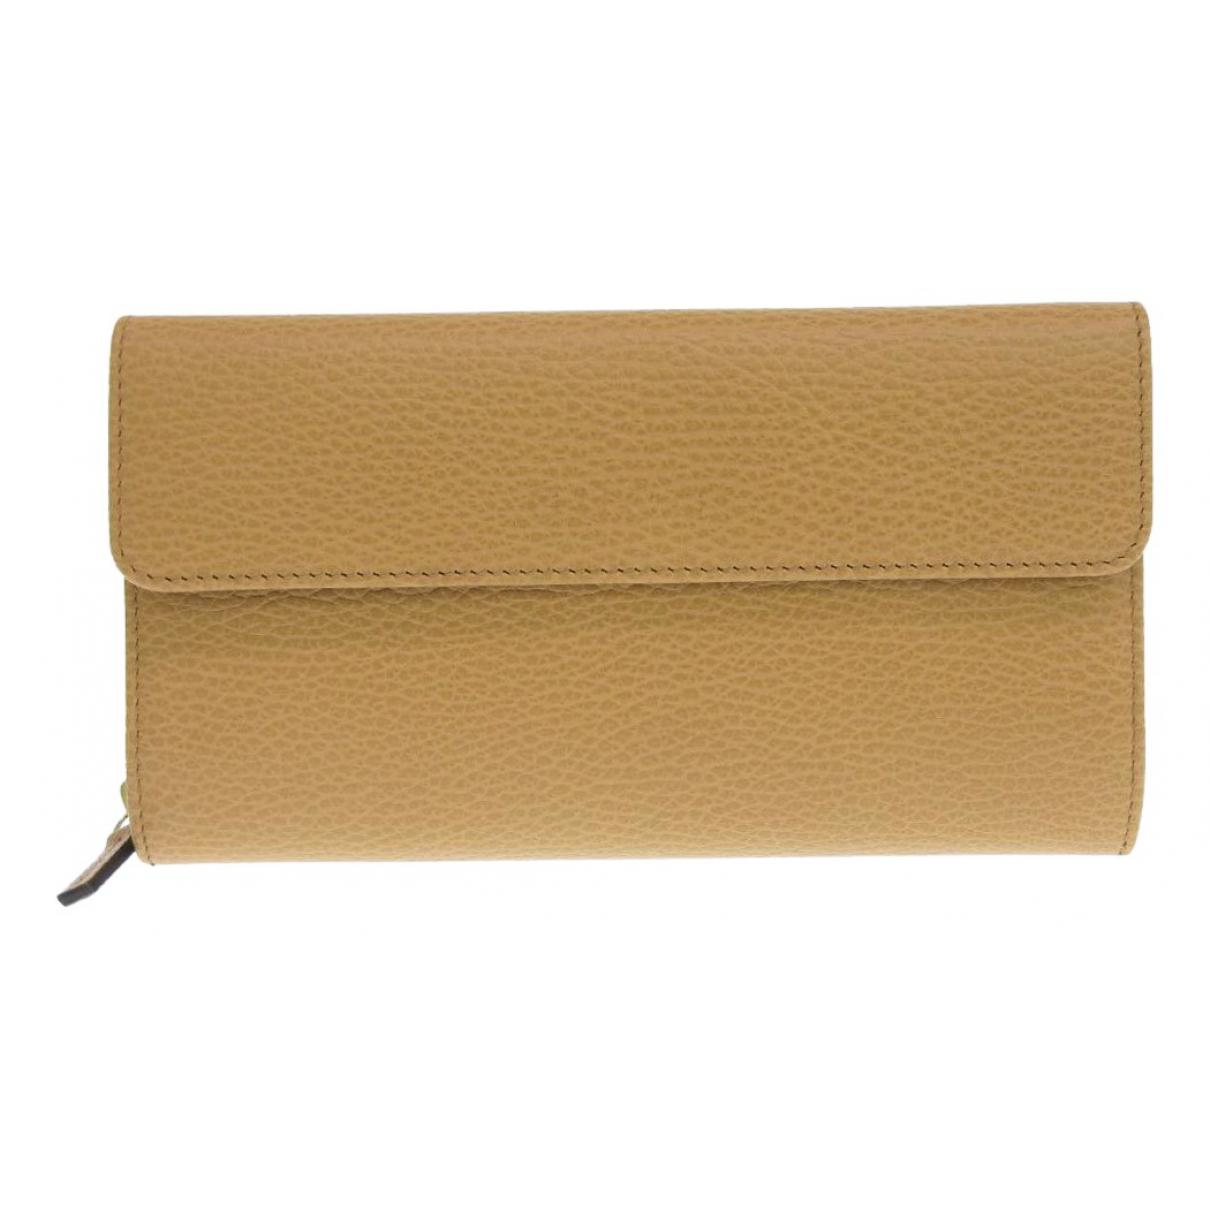 Gucci \N Beige Leather wallet for Women \N